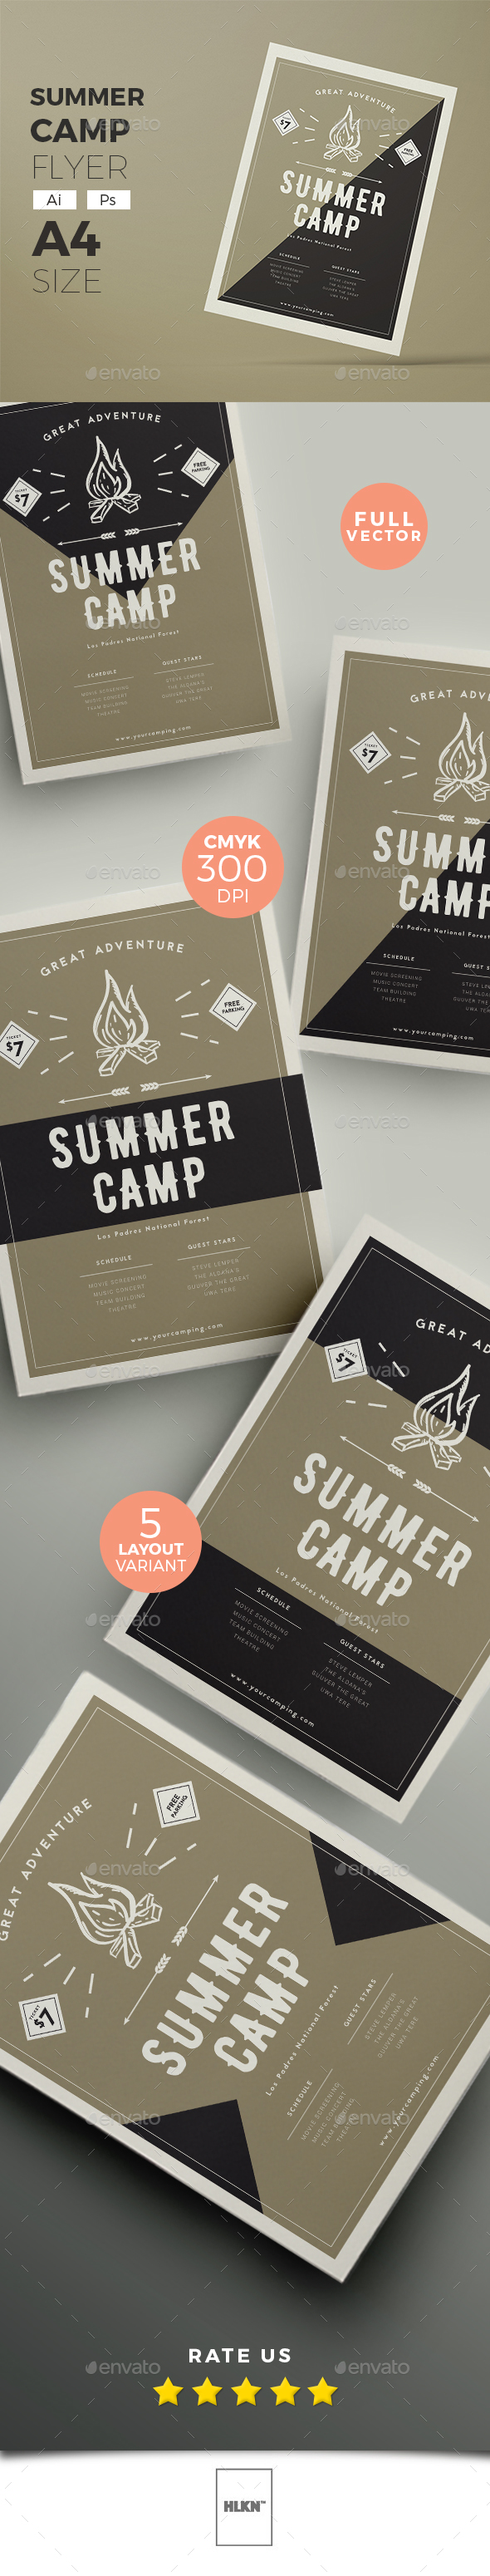 5 in 1 Summer Camp Flyer